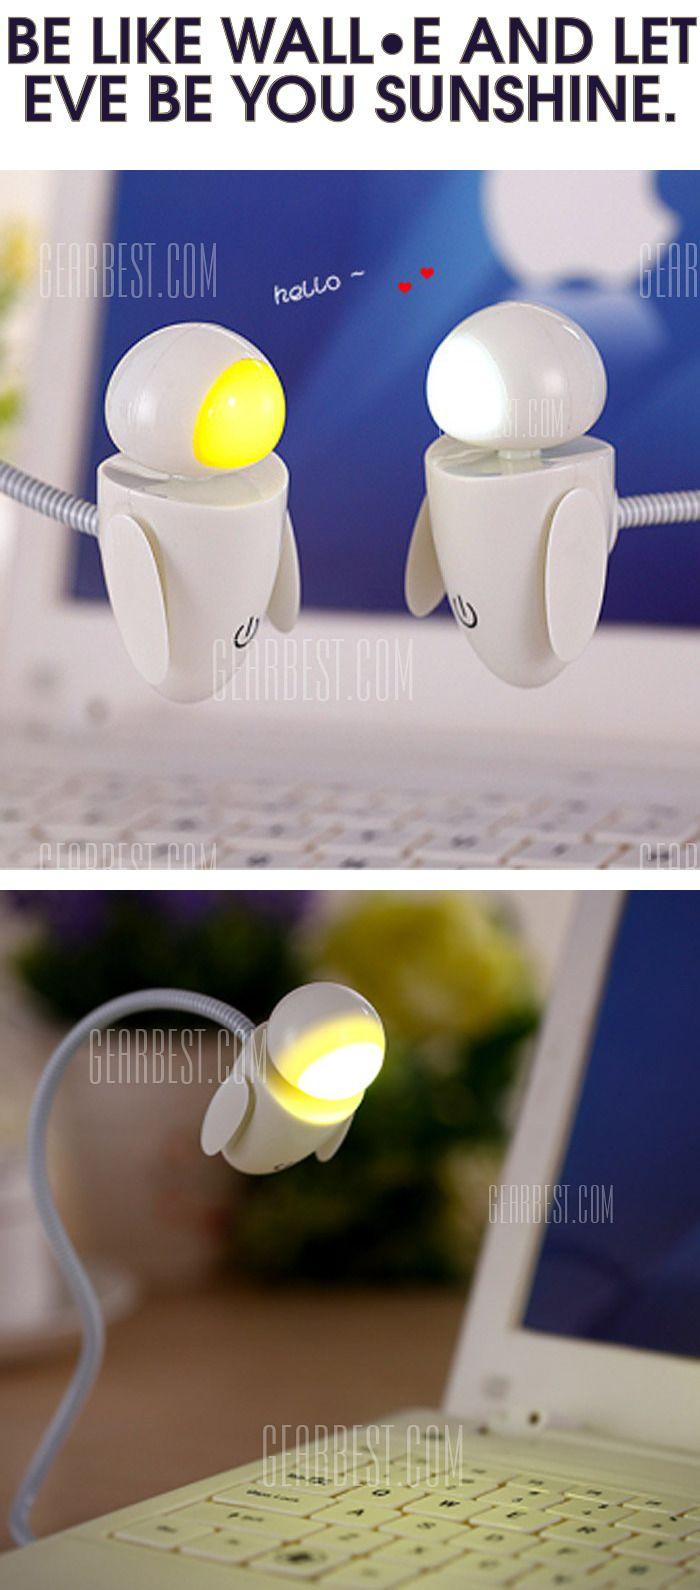 Creative #Robot Design #LED Night #Light Adjustable Brightness #pixar #walle #eve